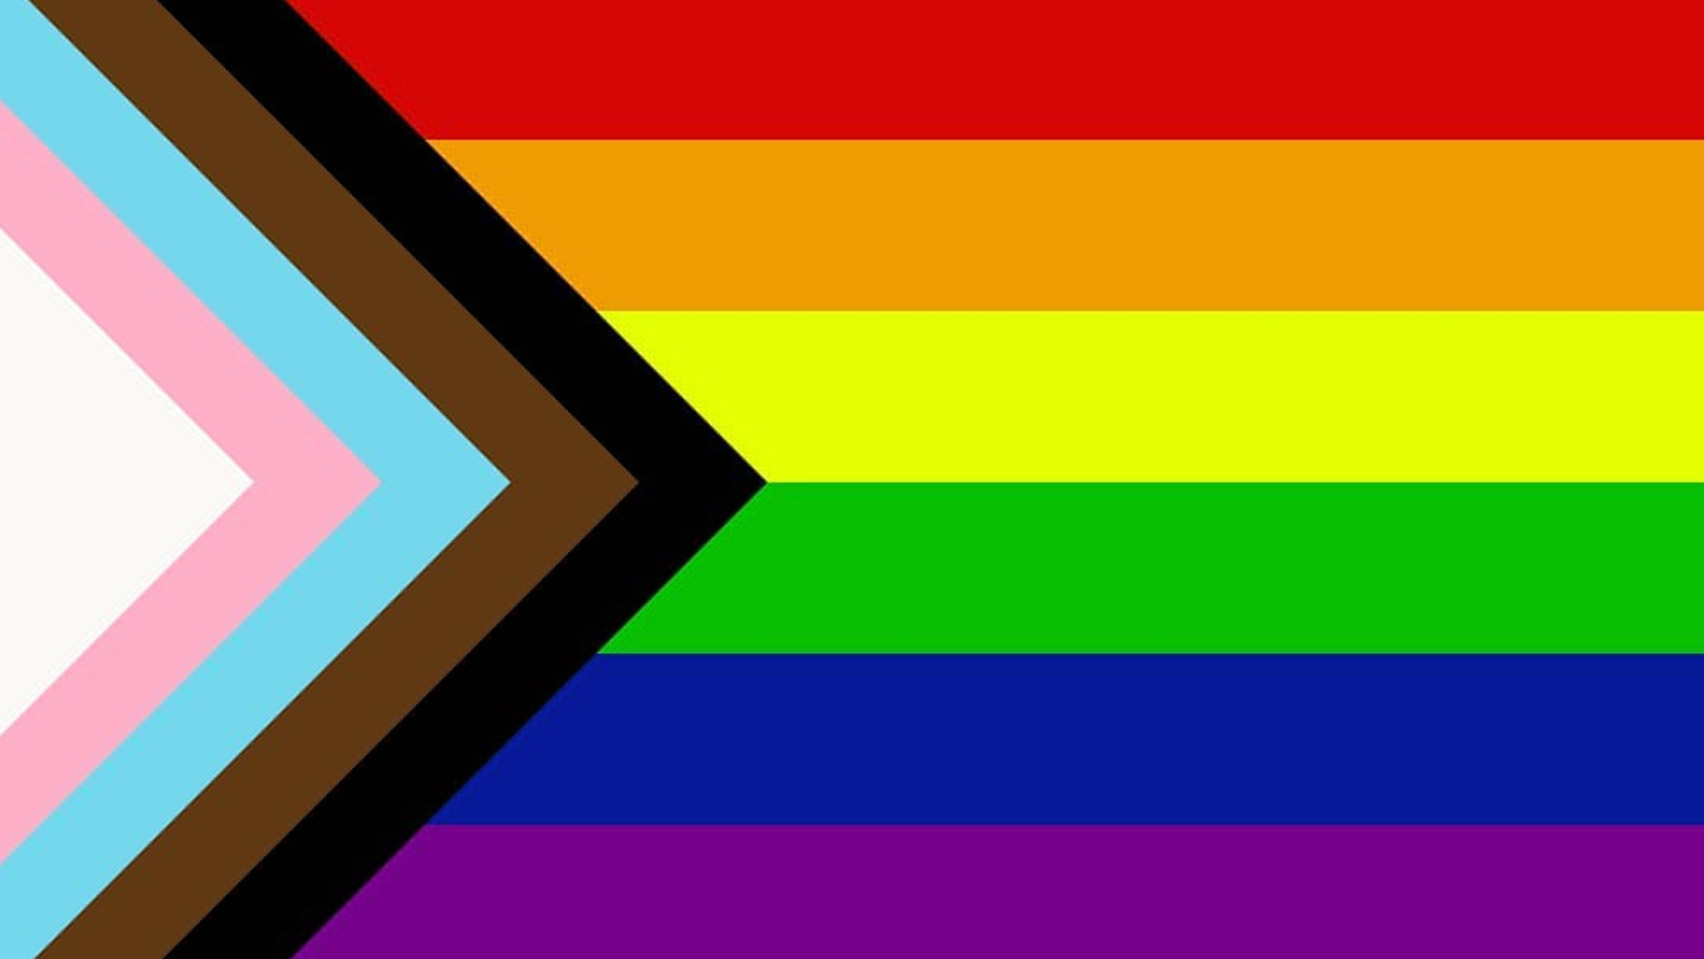 Redesigned LGBTQ Pride flag